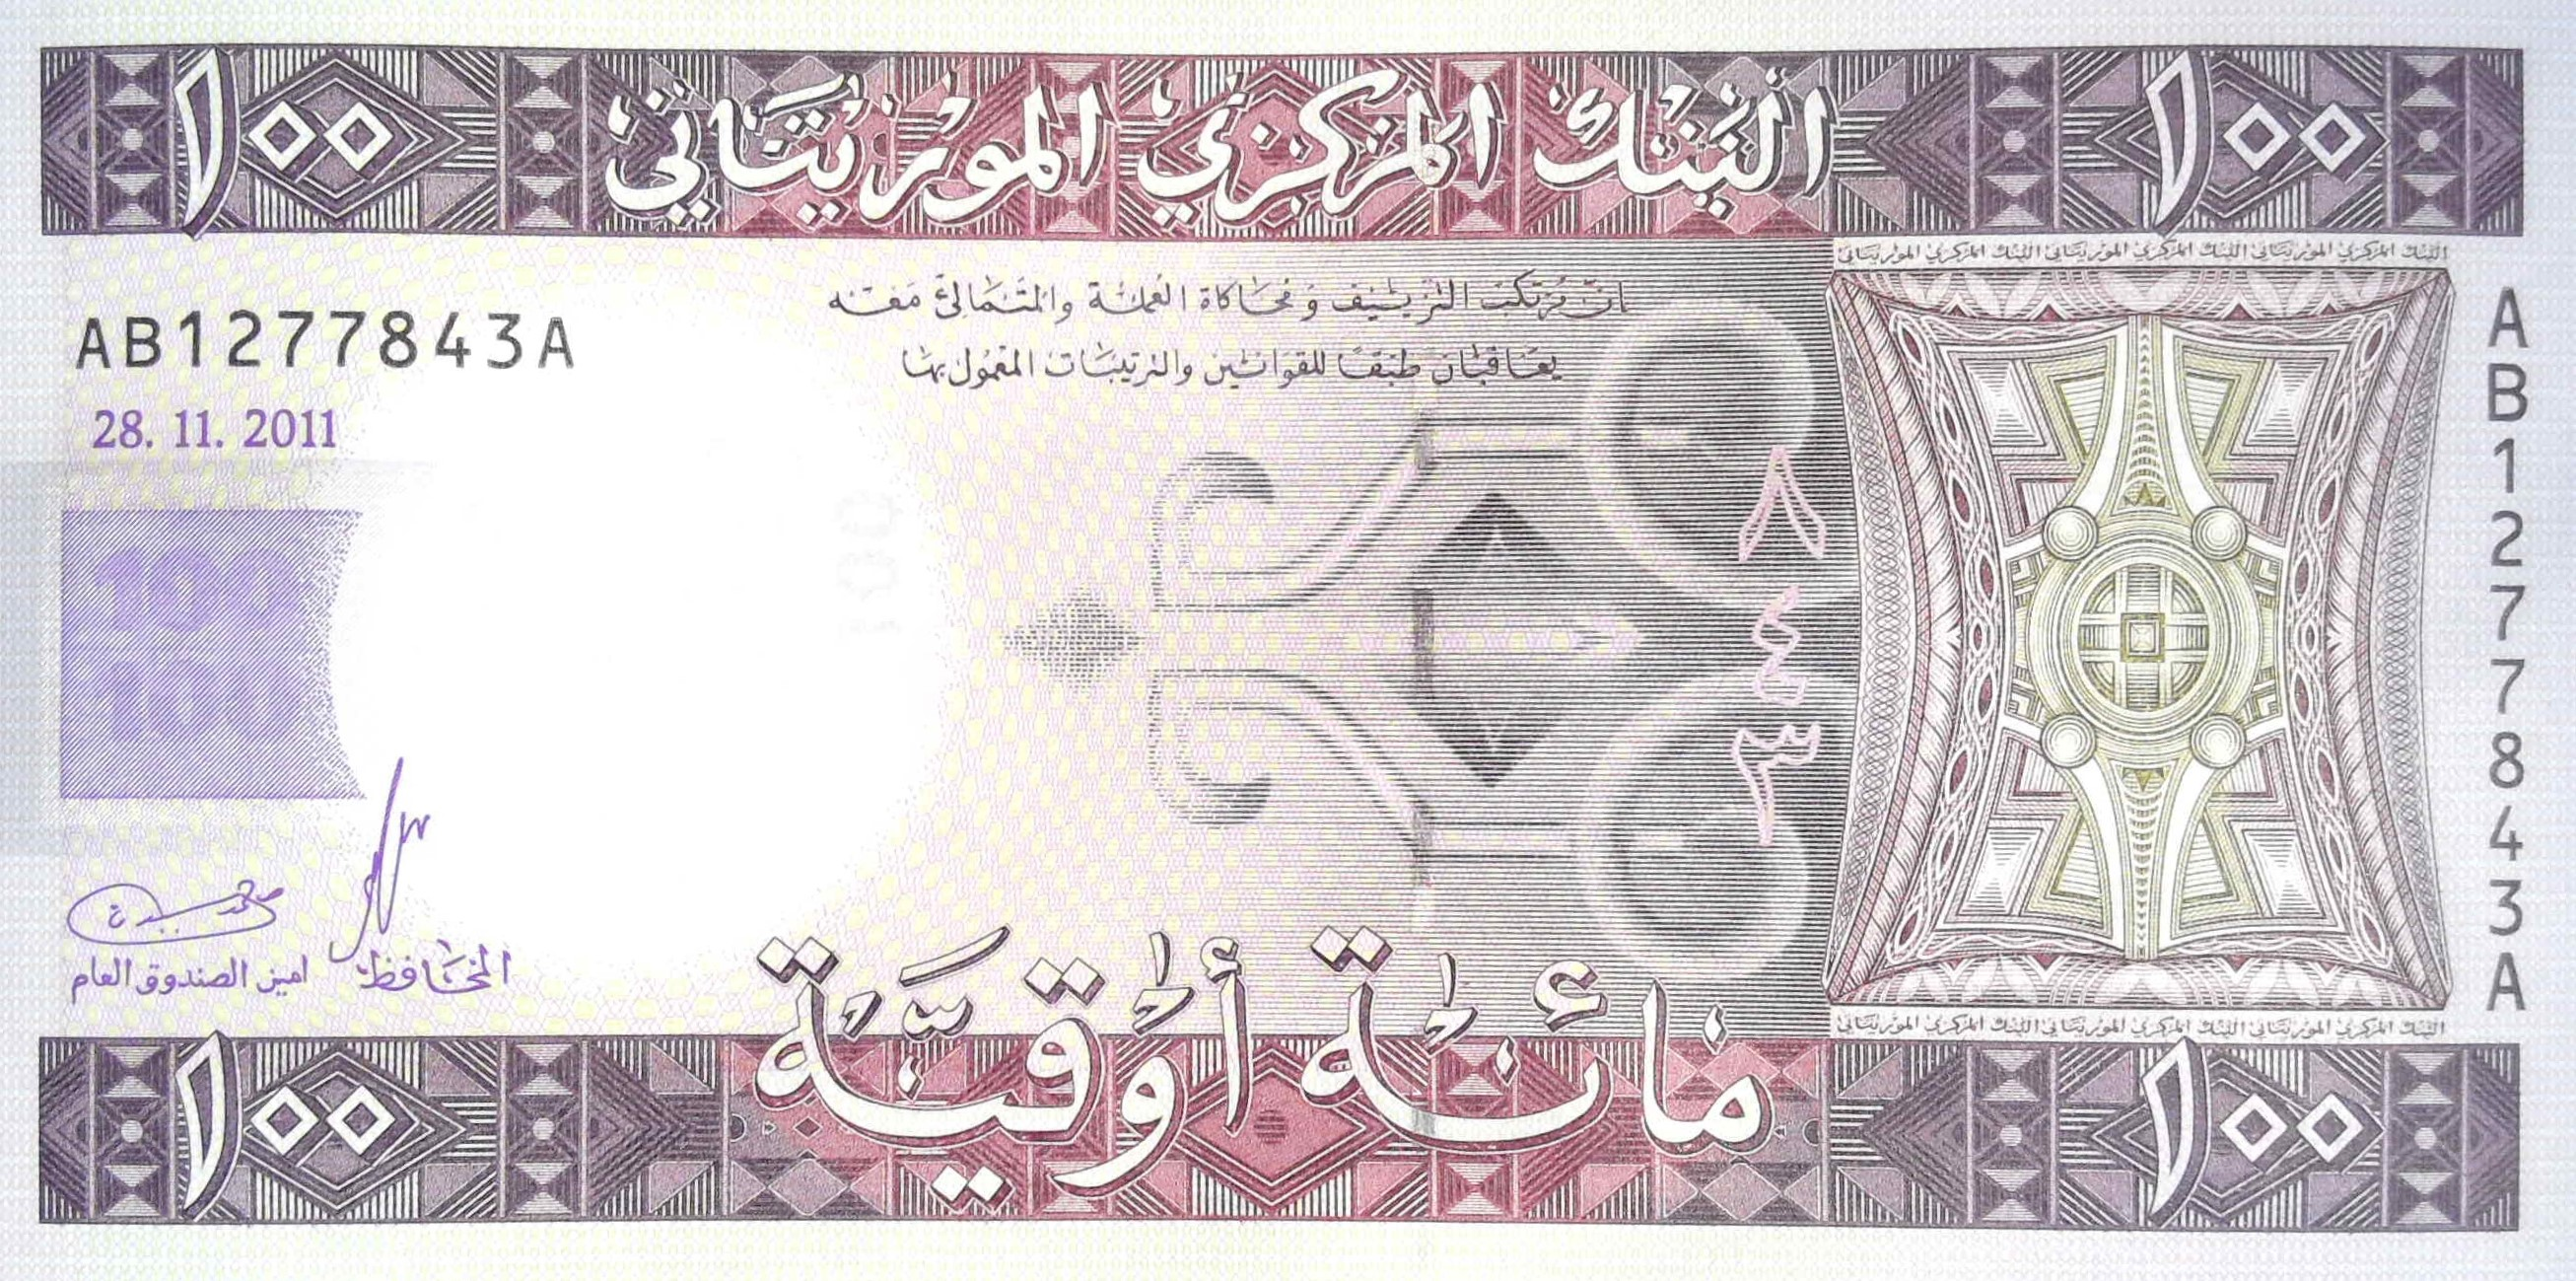 mauritania 100 ouguiya banknote back